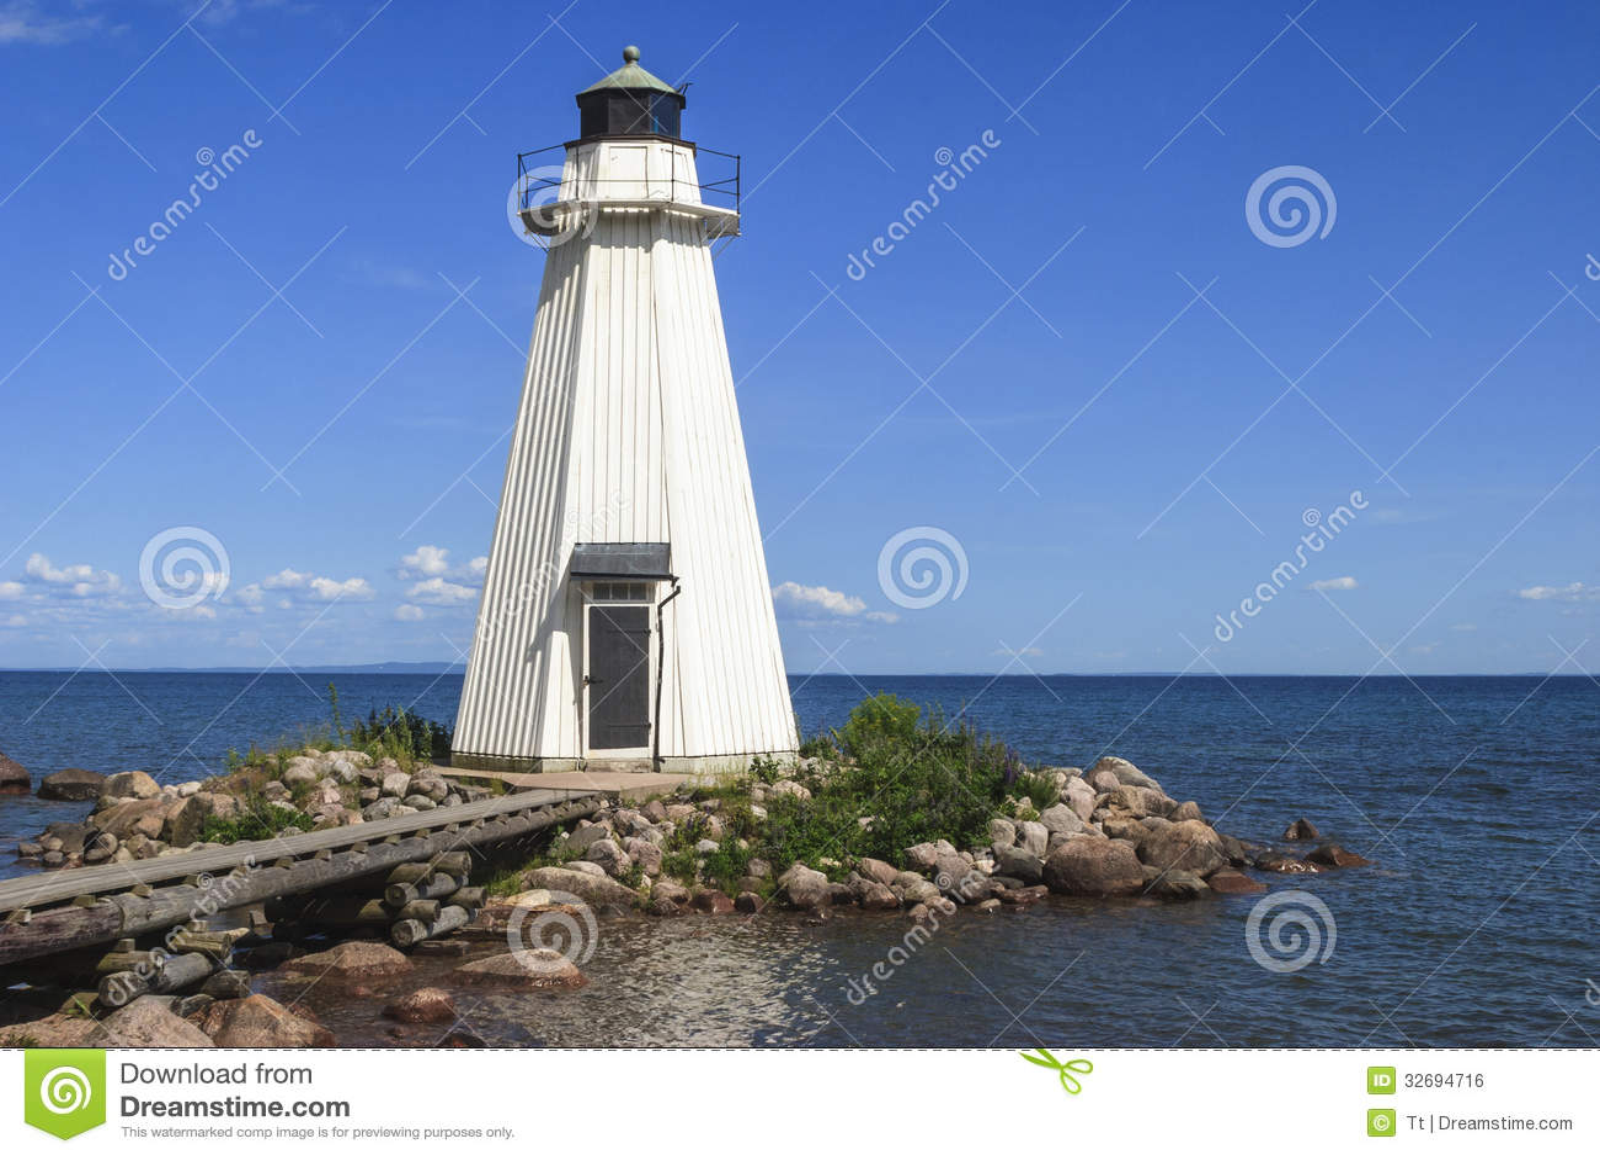 Wooden Lighthouse Royalty Free Stock Image Image 32694716